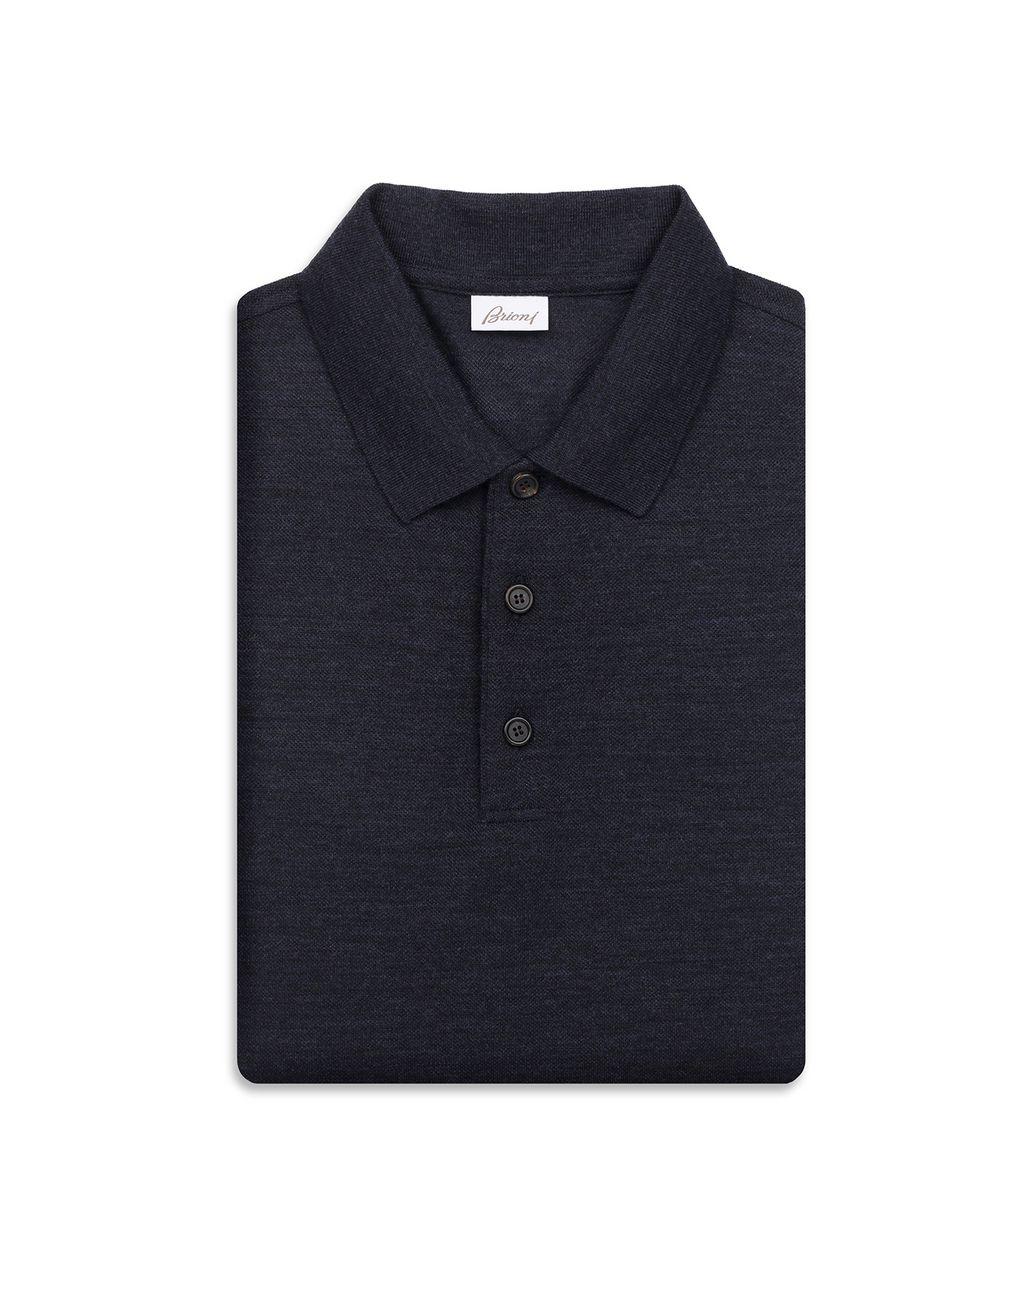 BRIONI Polo à manches longues bleu marine T-shirts & polos Homme e